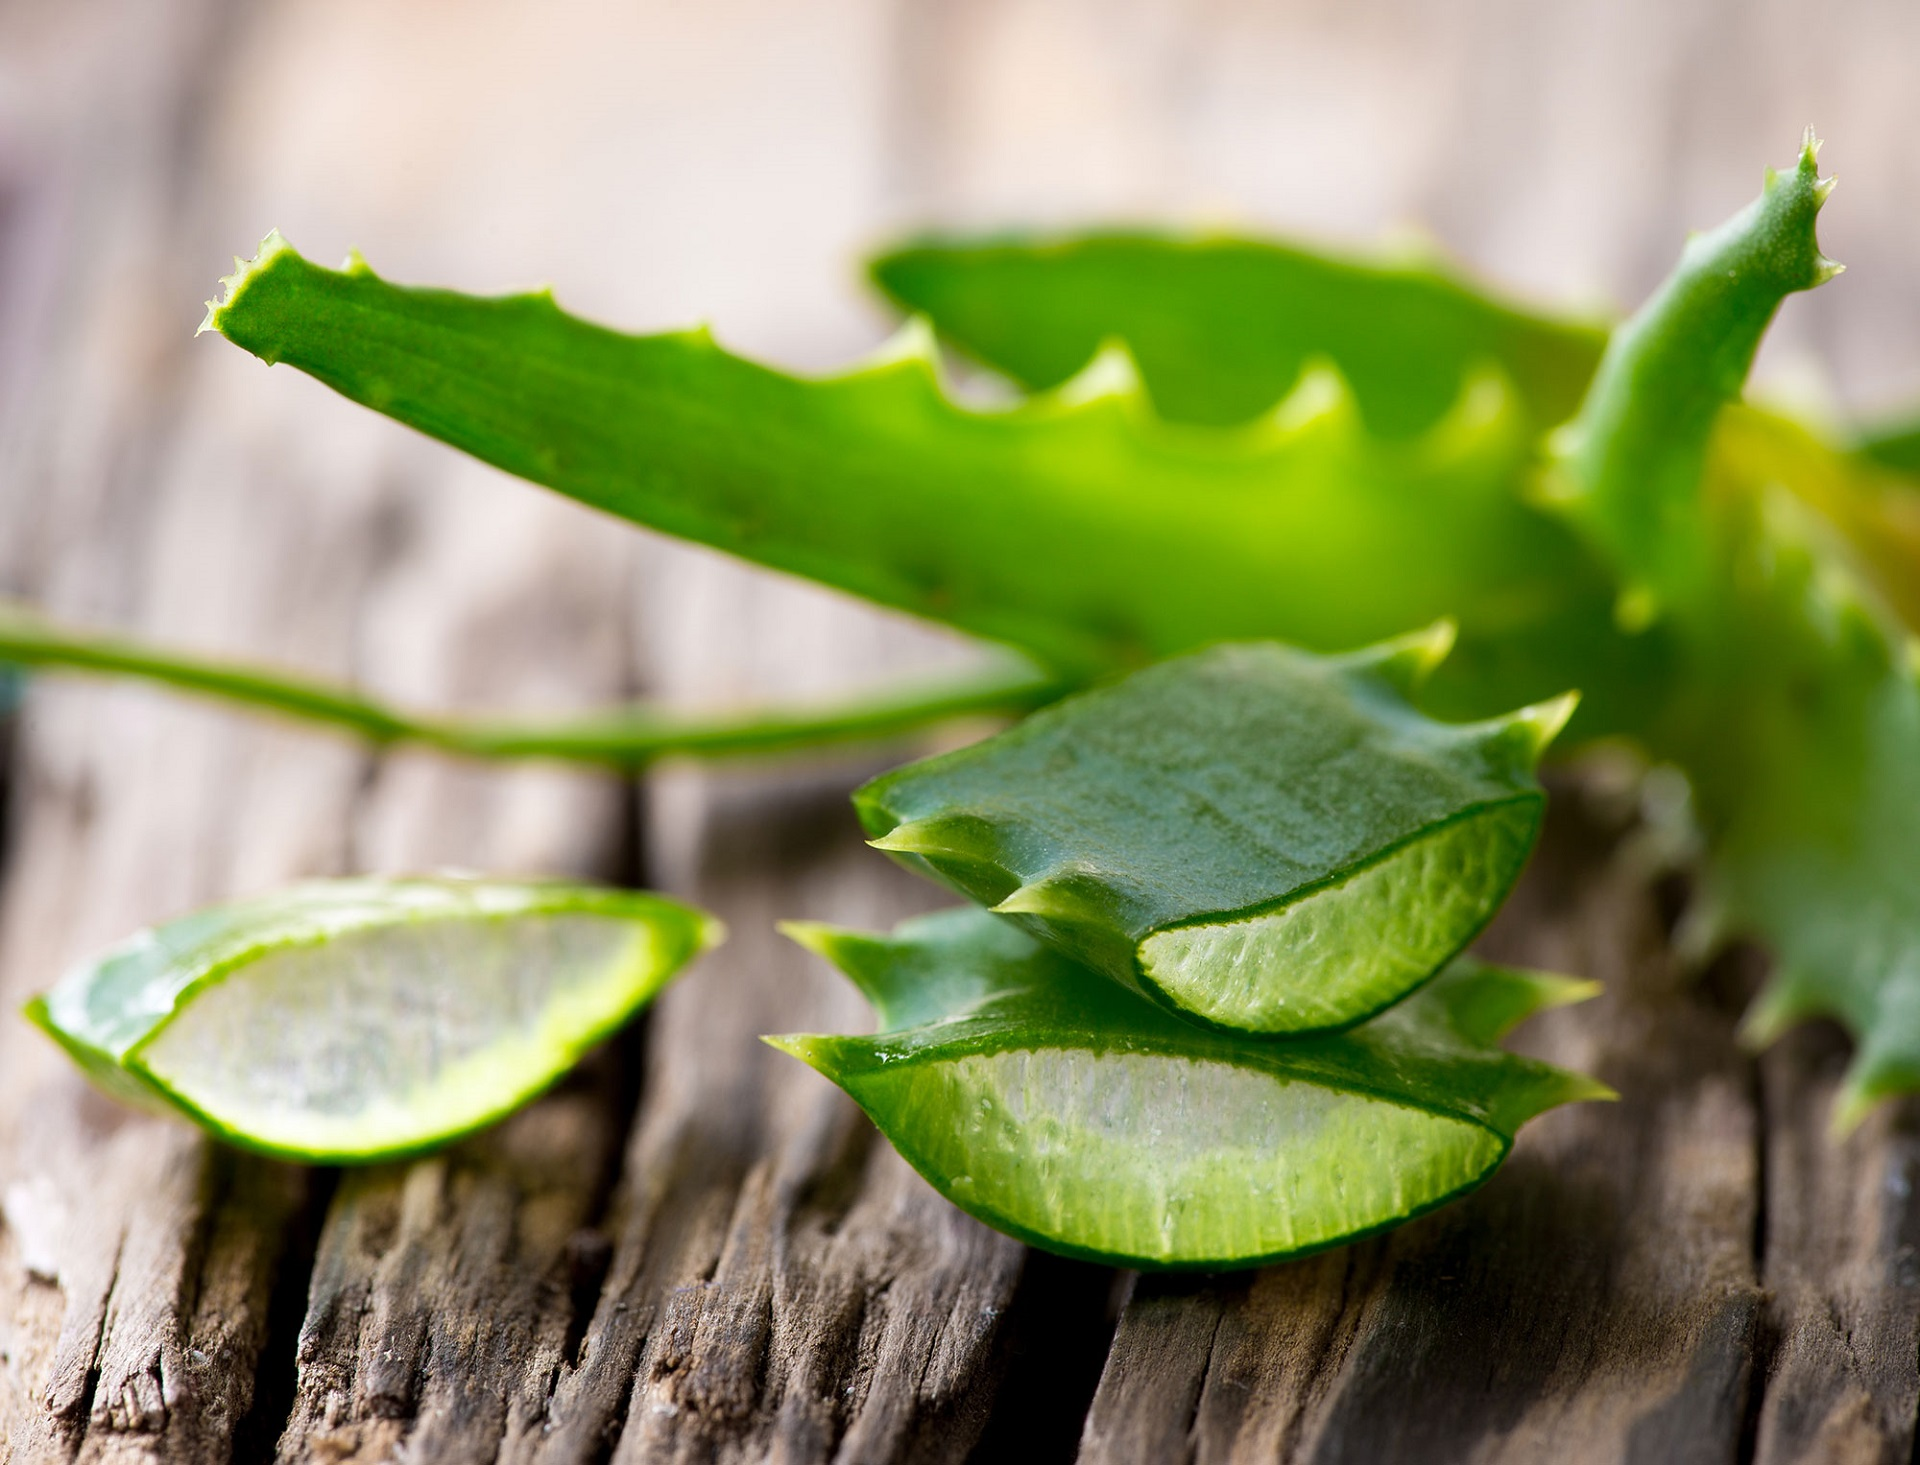 Aloe Vera leaves on wooden background